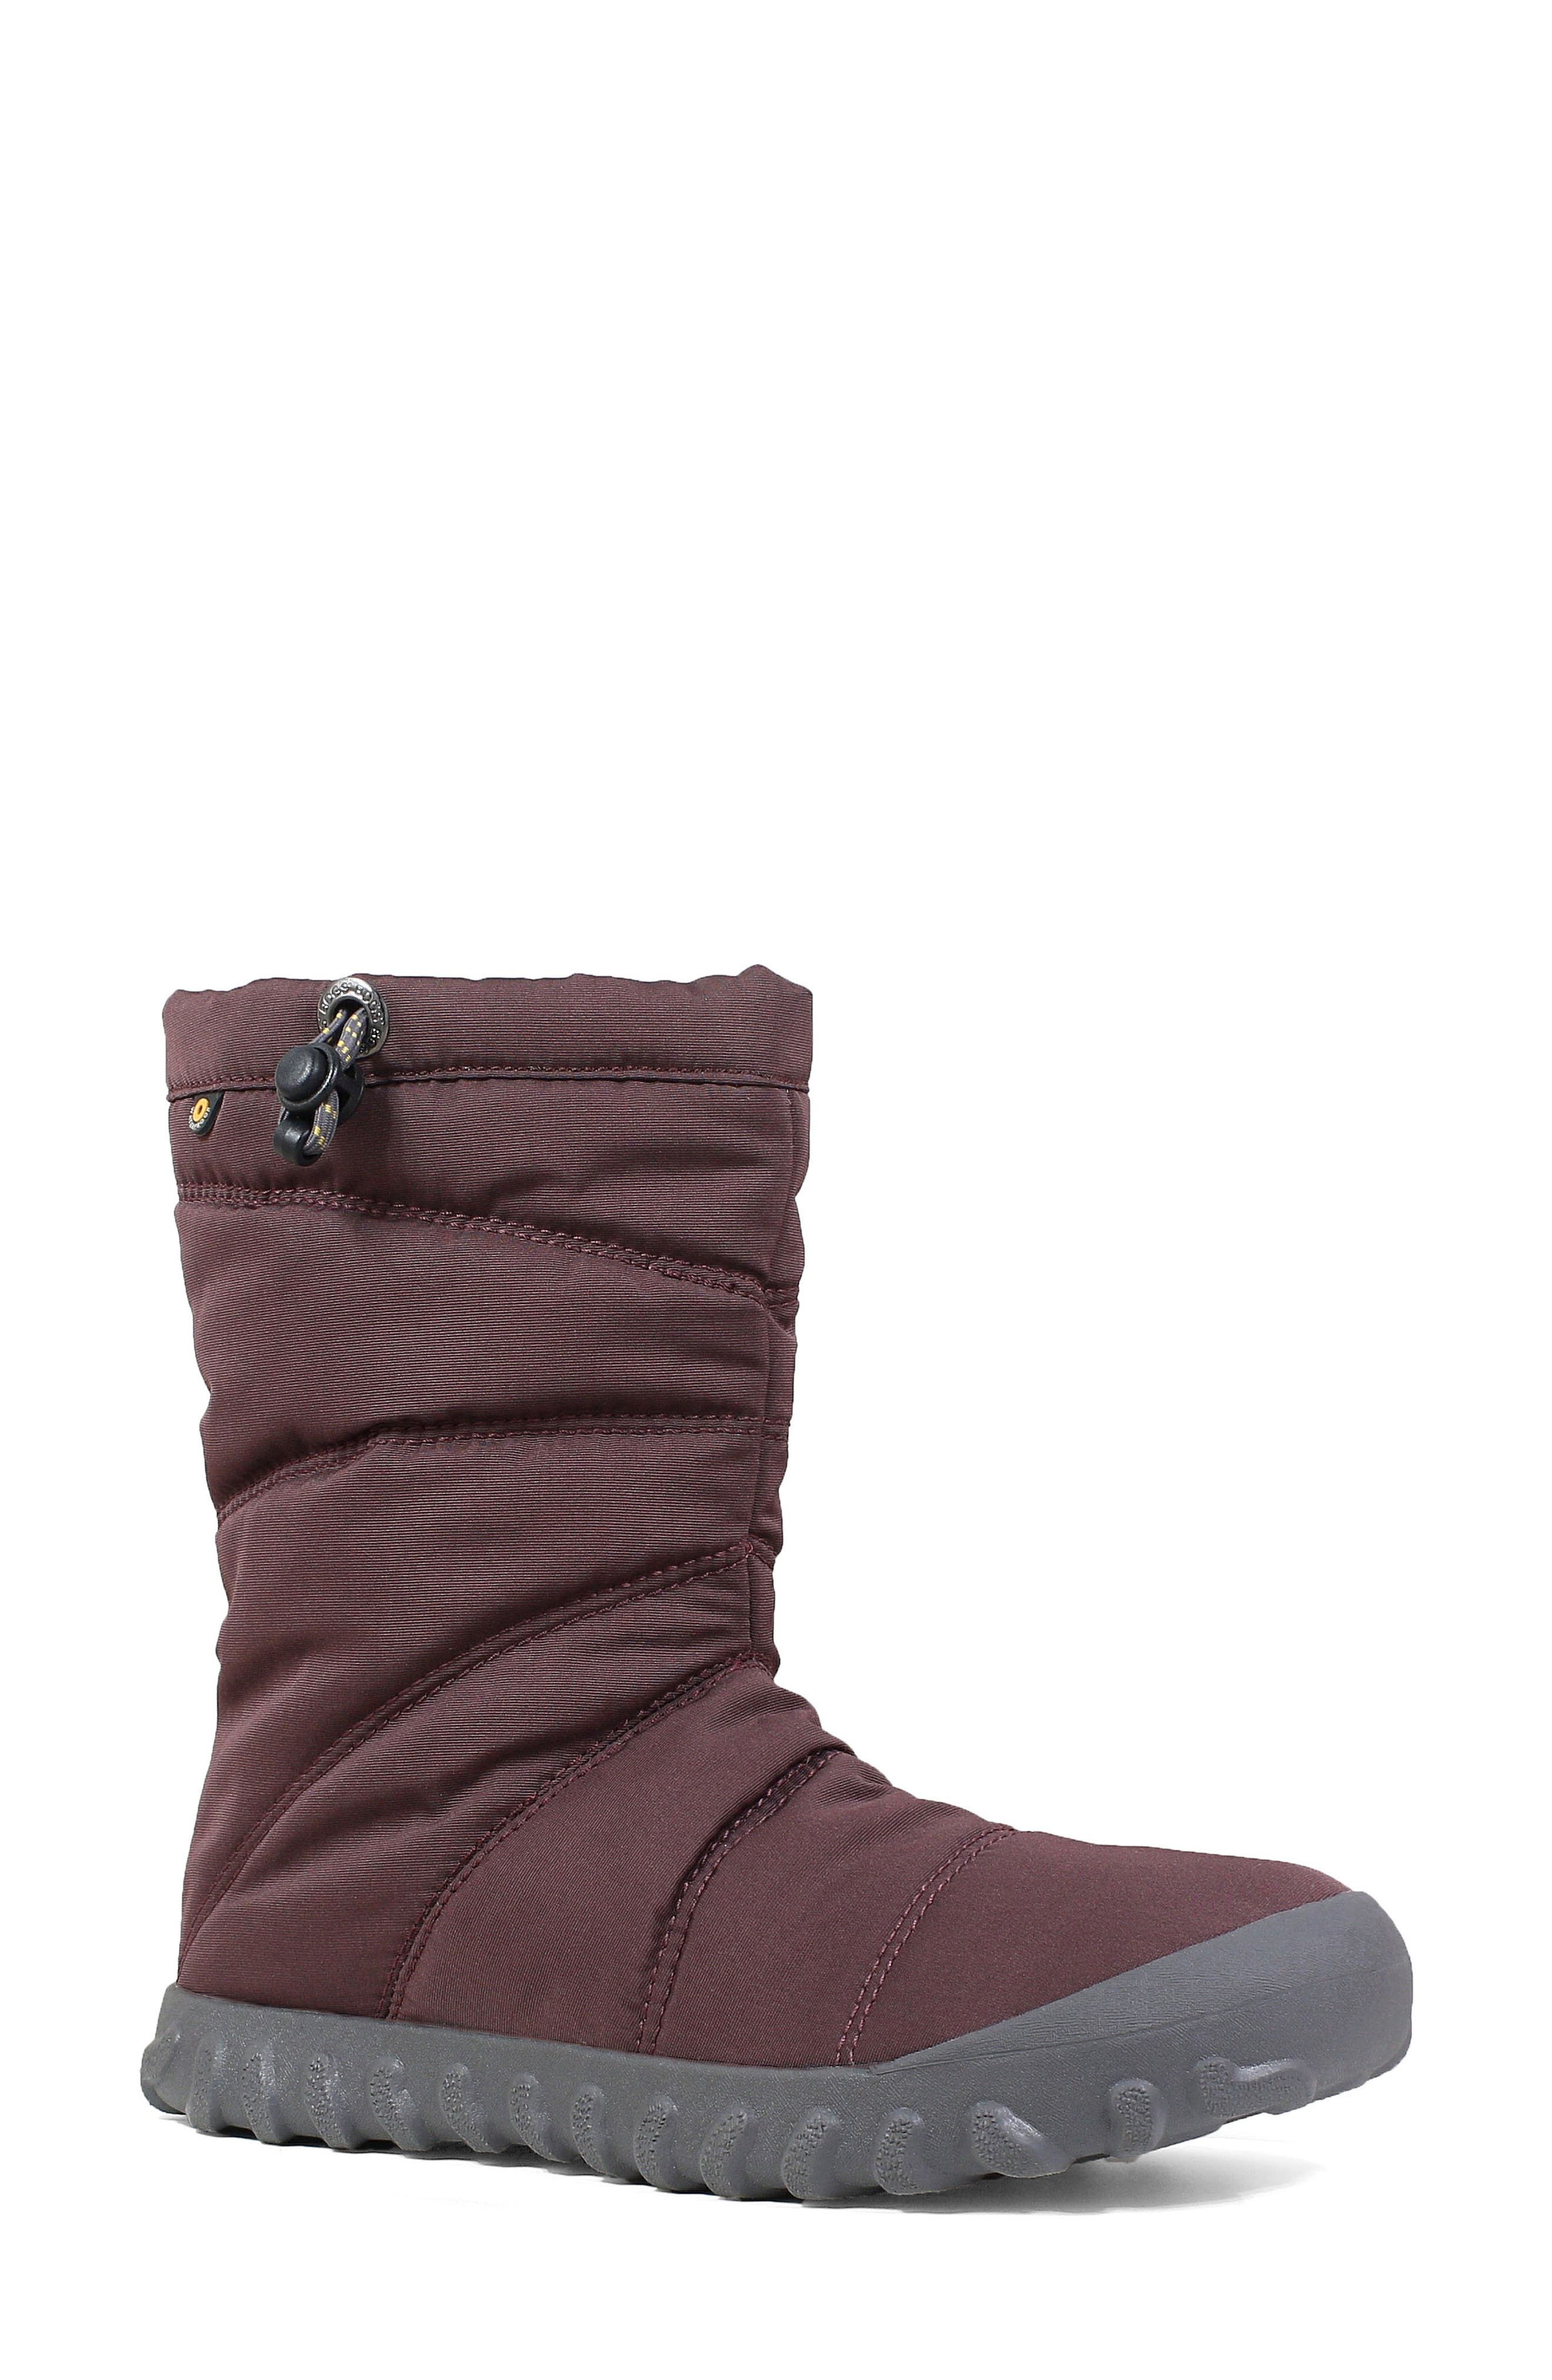 Bogs Puffy Insulated Waterproof Boot, Purple